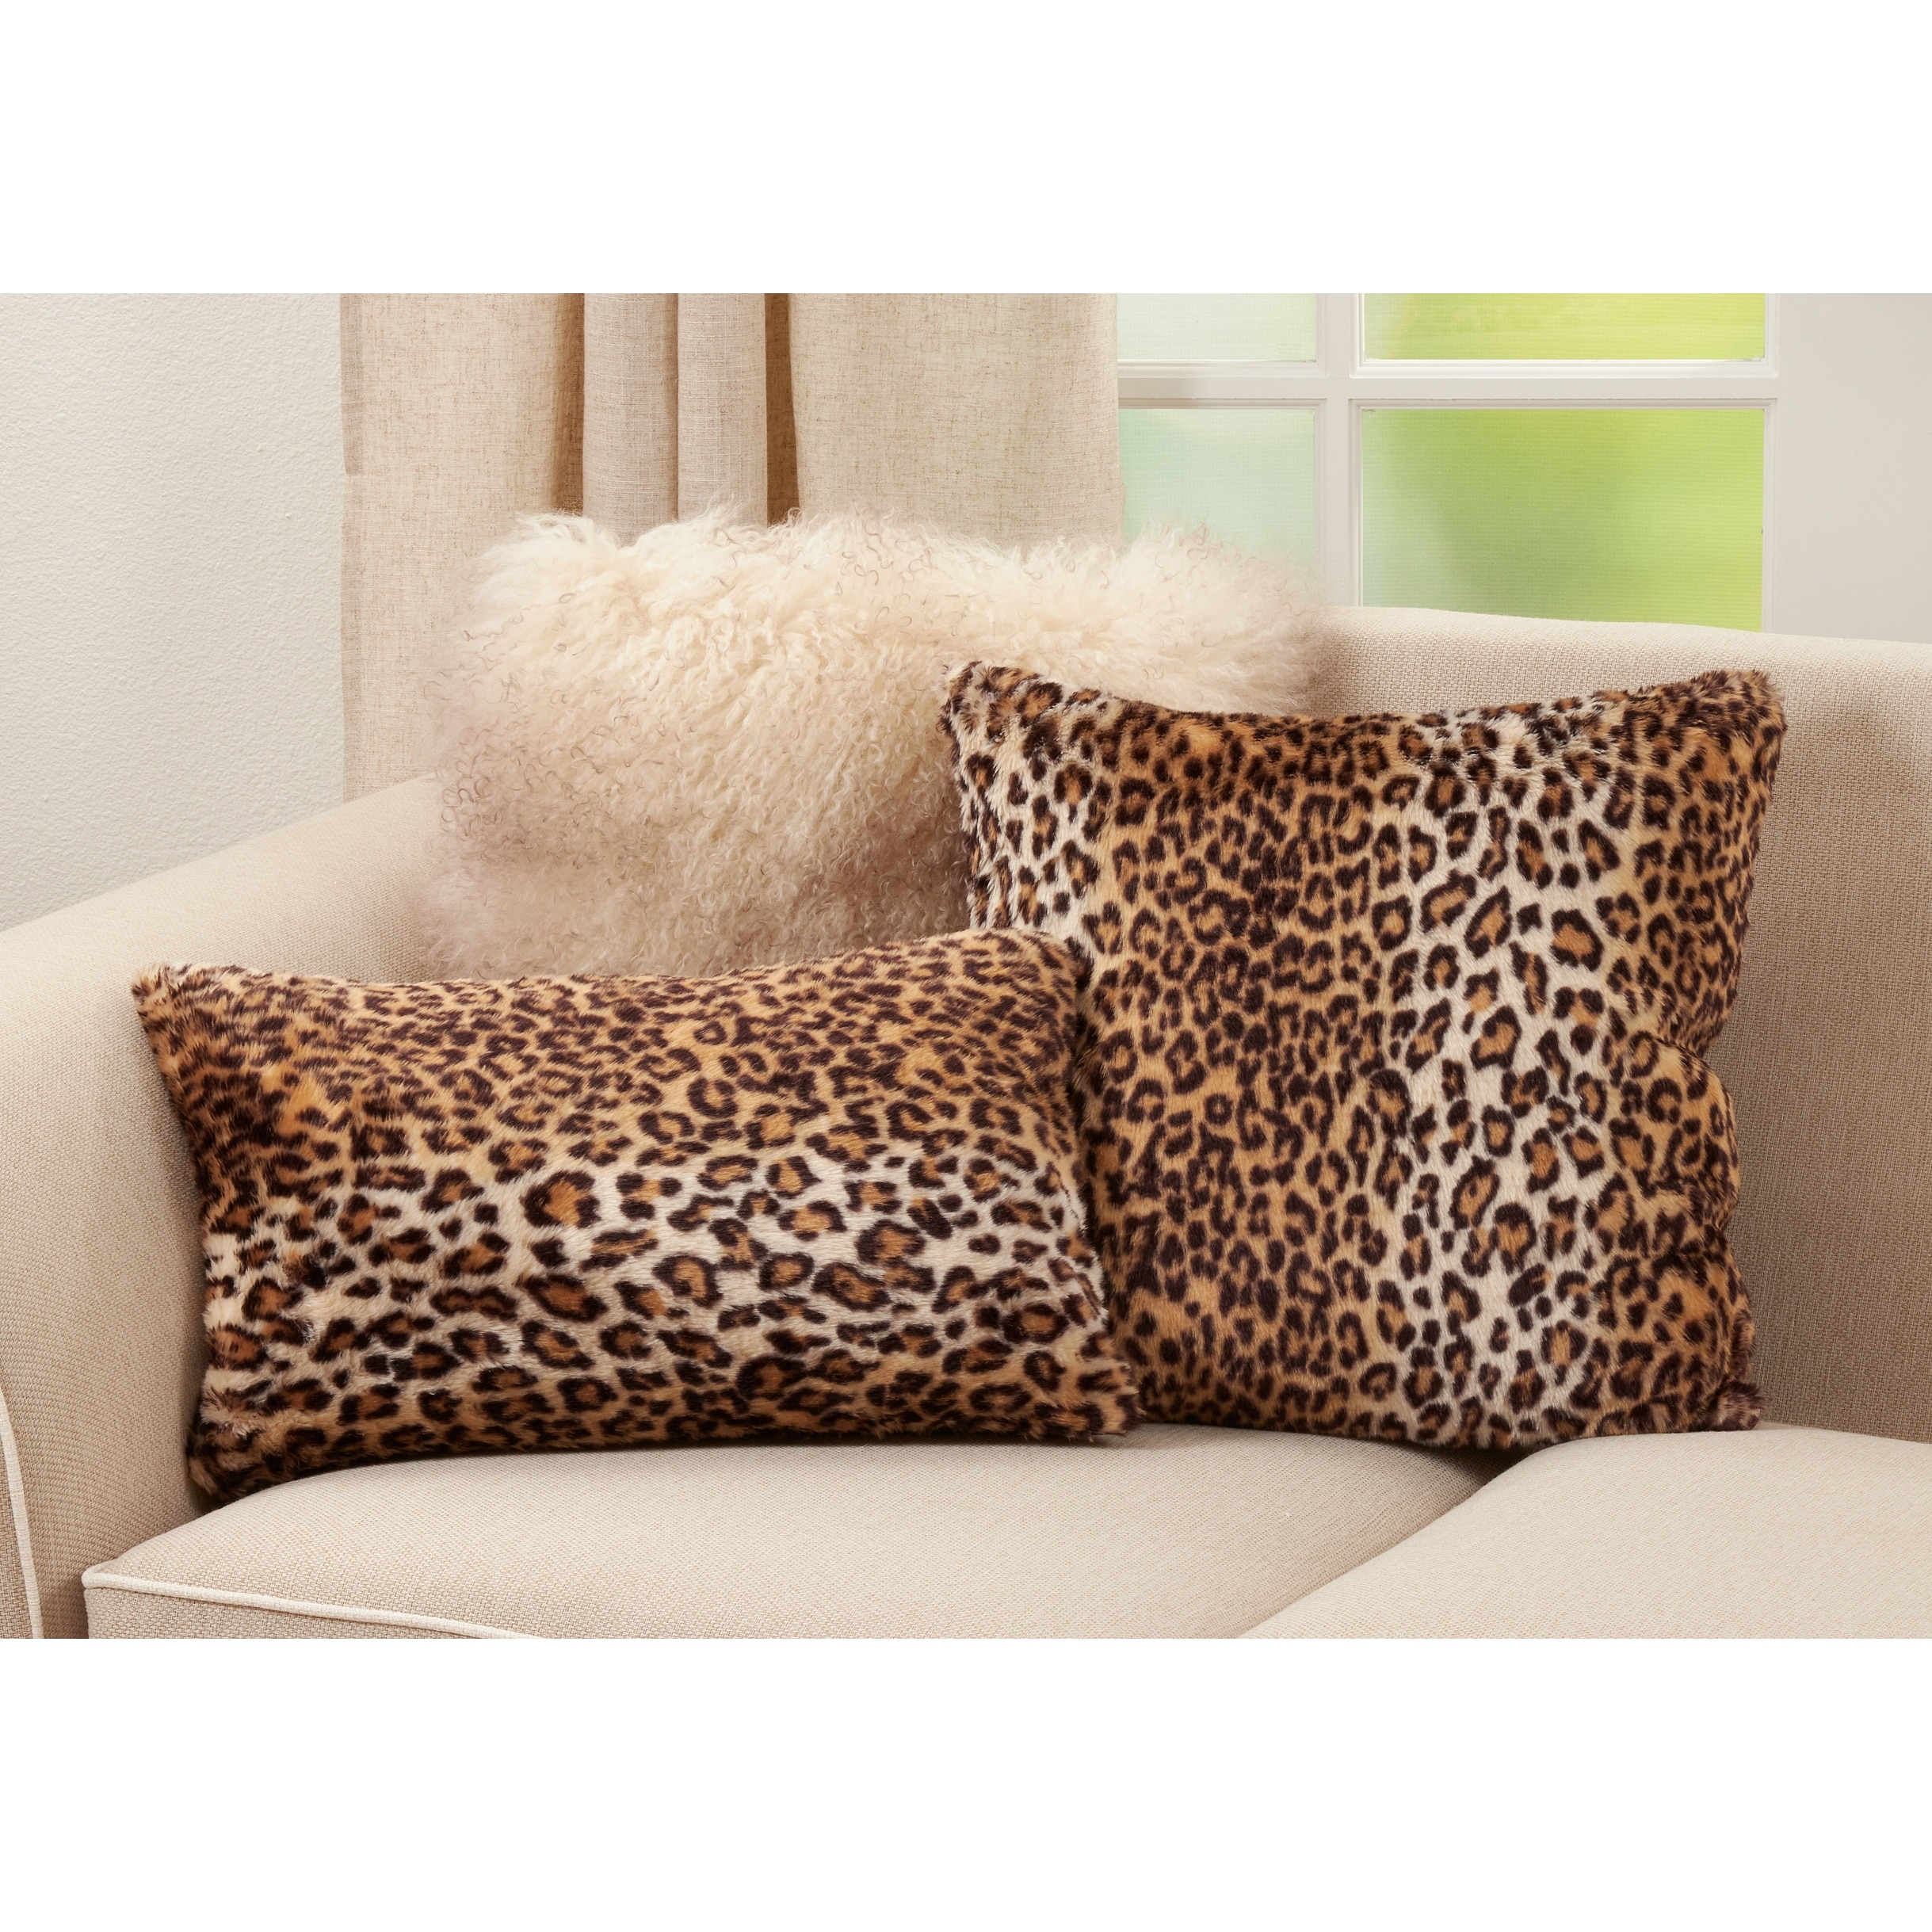 faux pillow with cheetah print